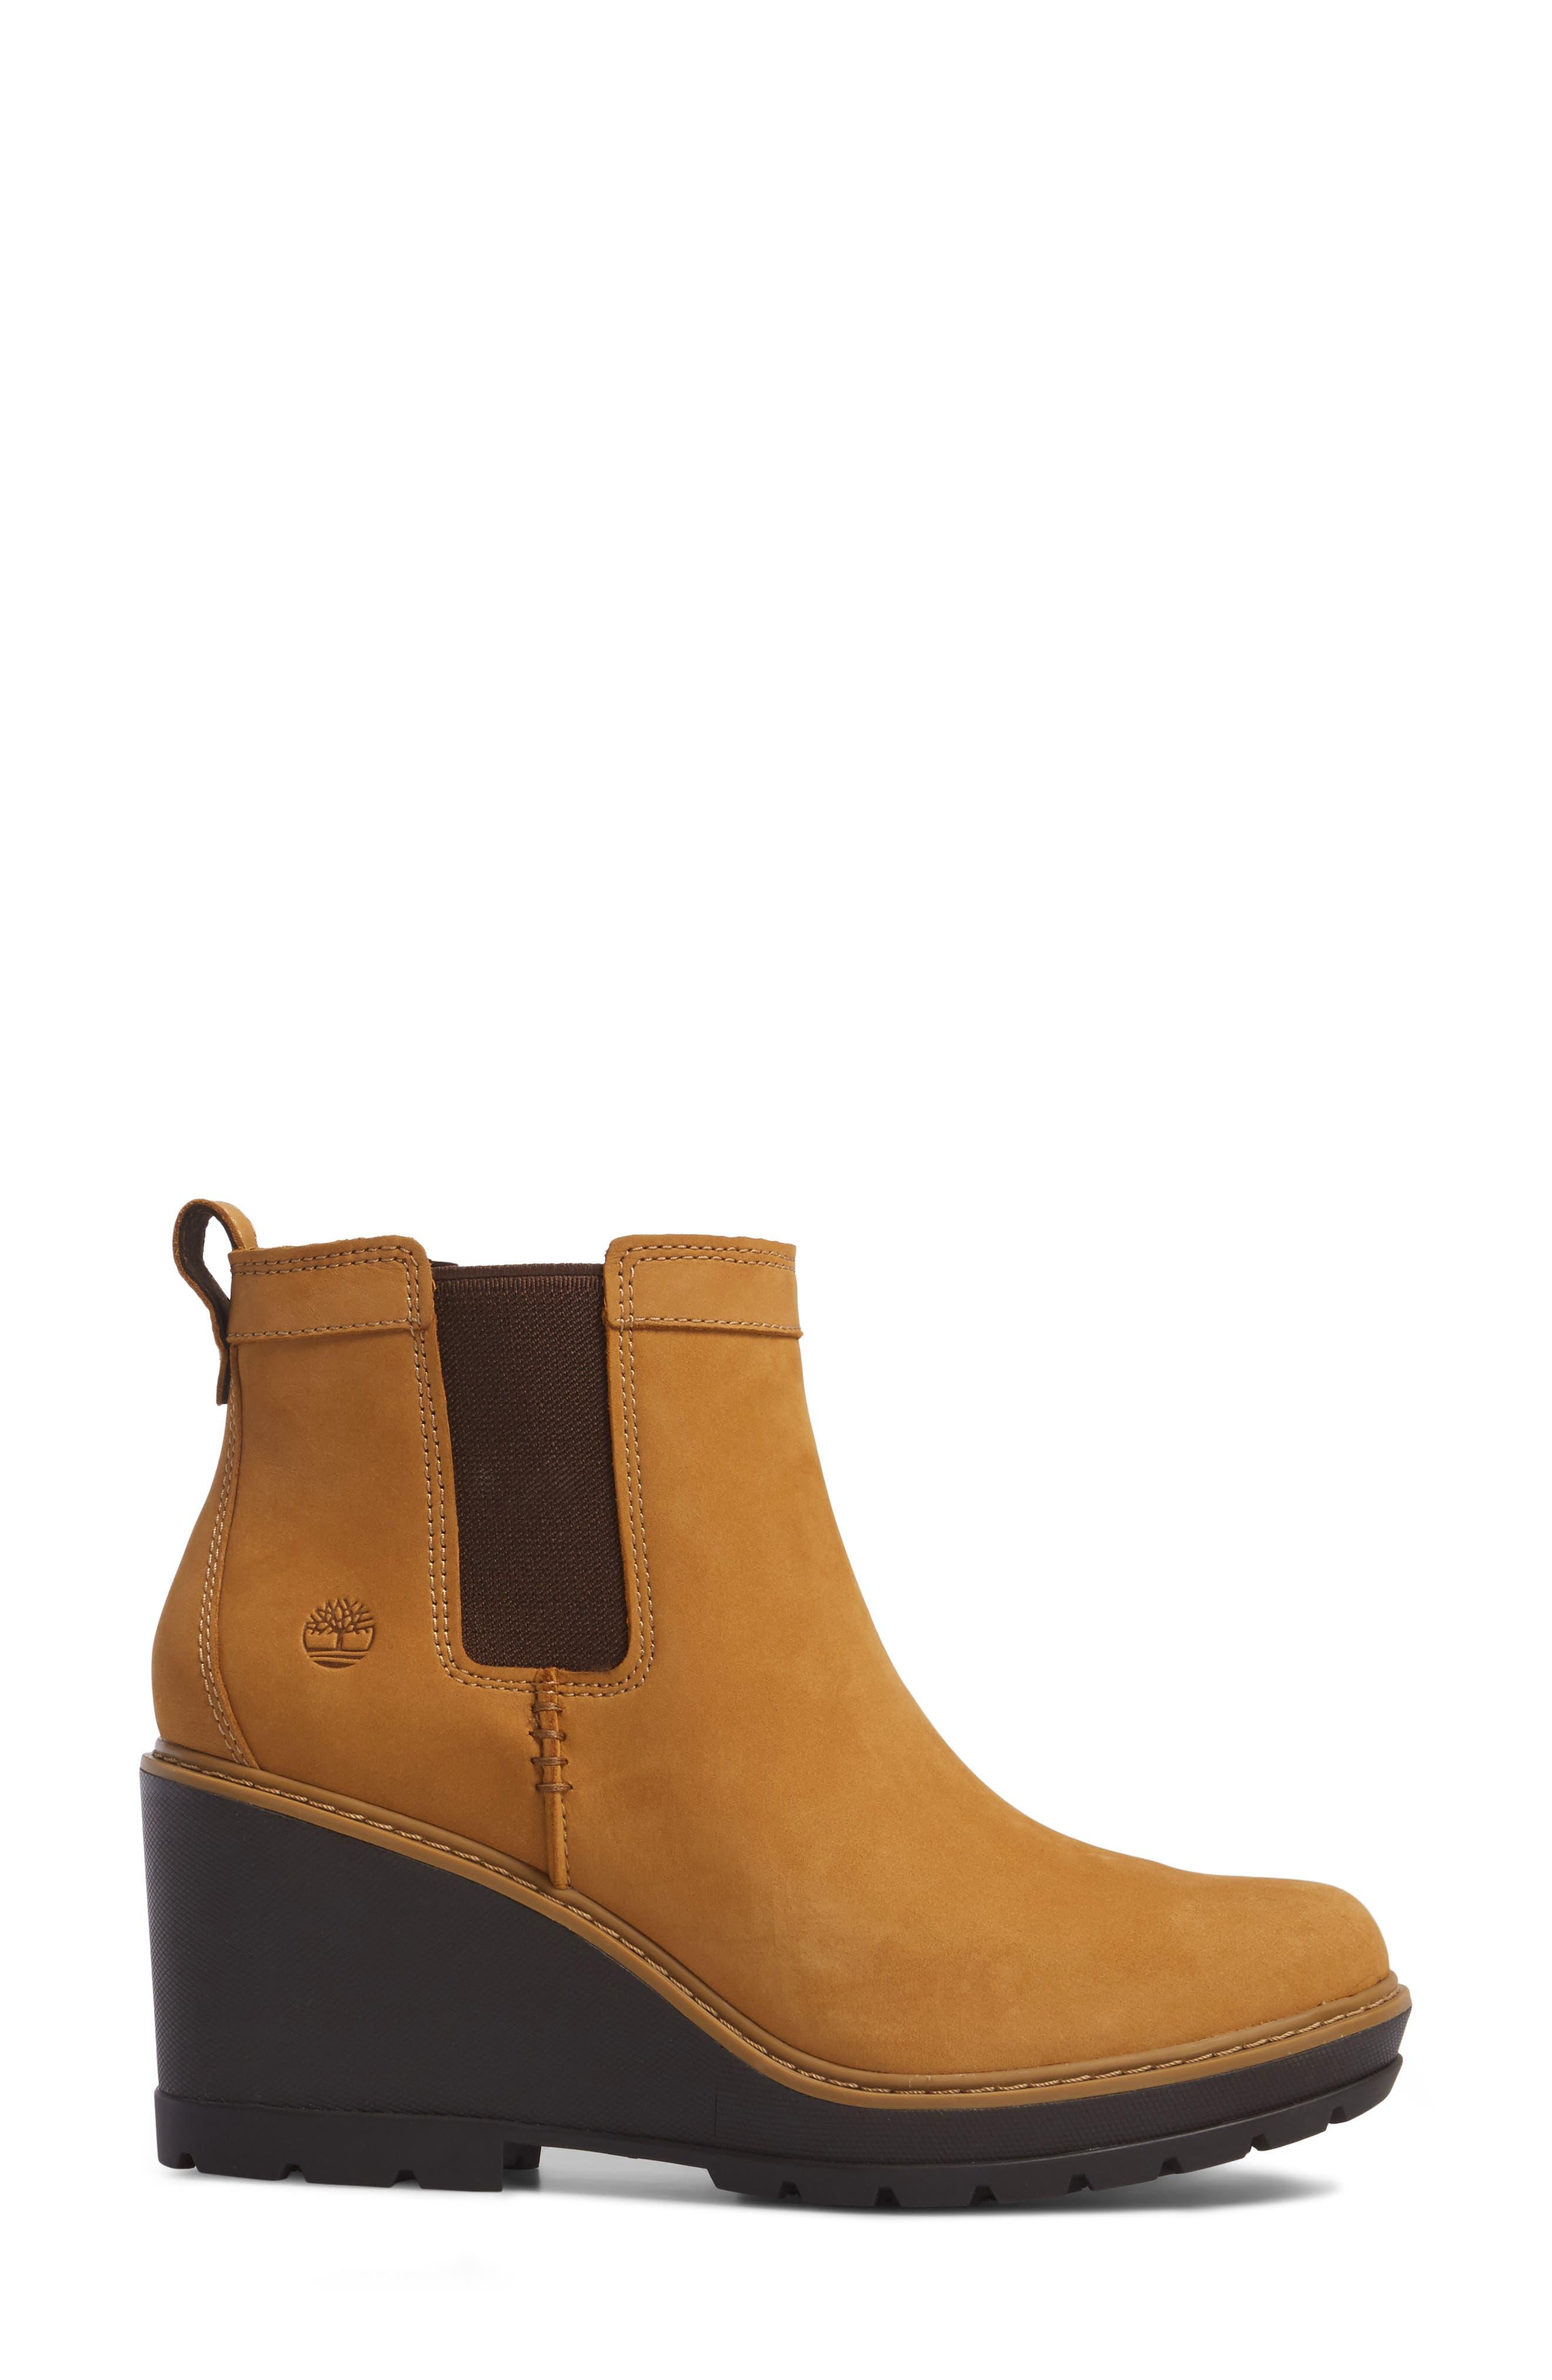 Kellis Water Resistant Chelsea Wedge Boot,                             Alternate thumbnail 3, color,                             Wheat Nubuck